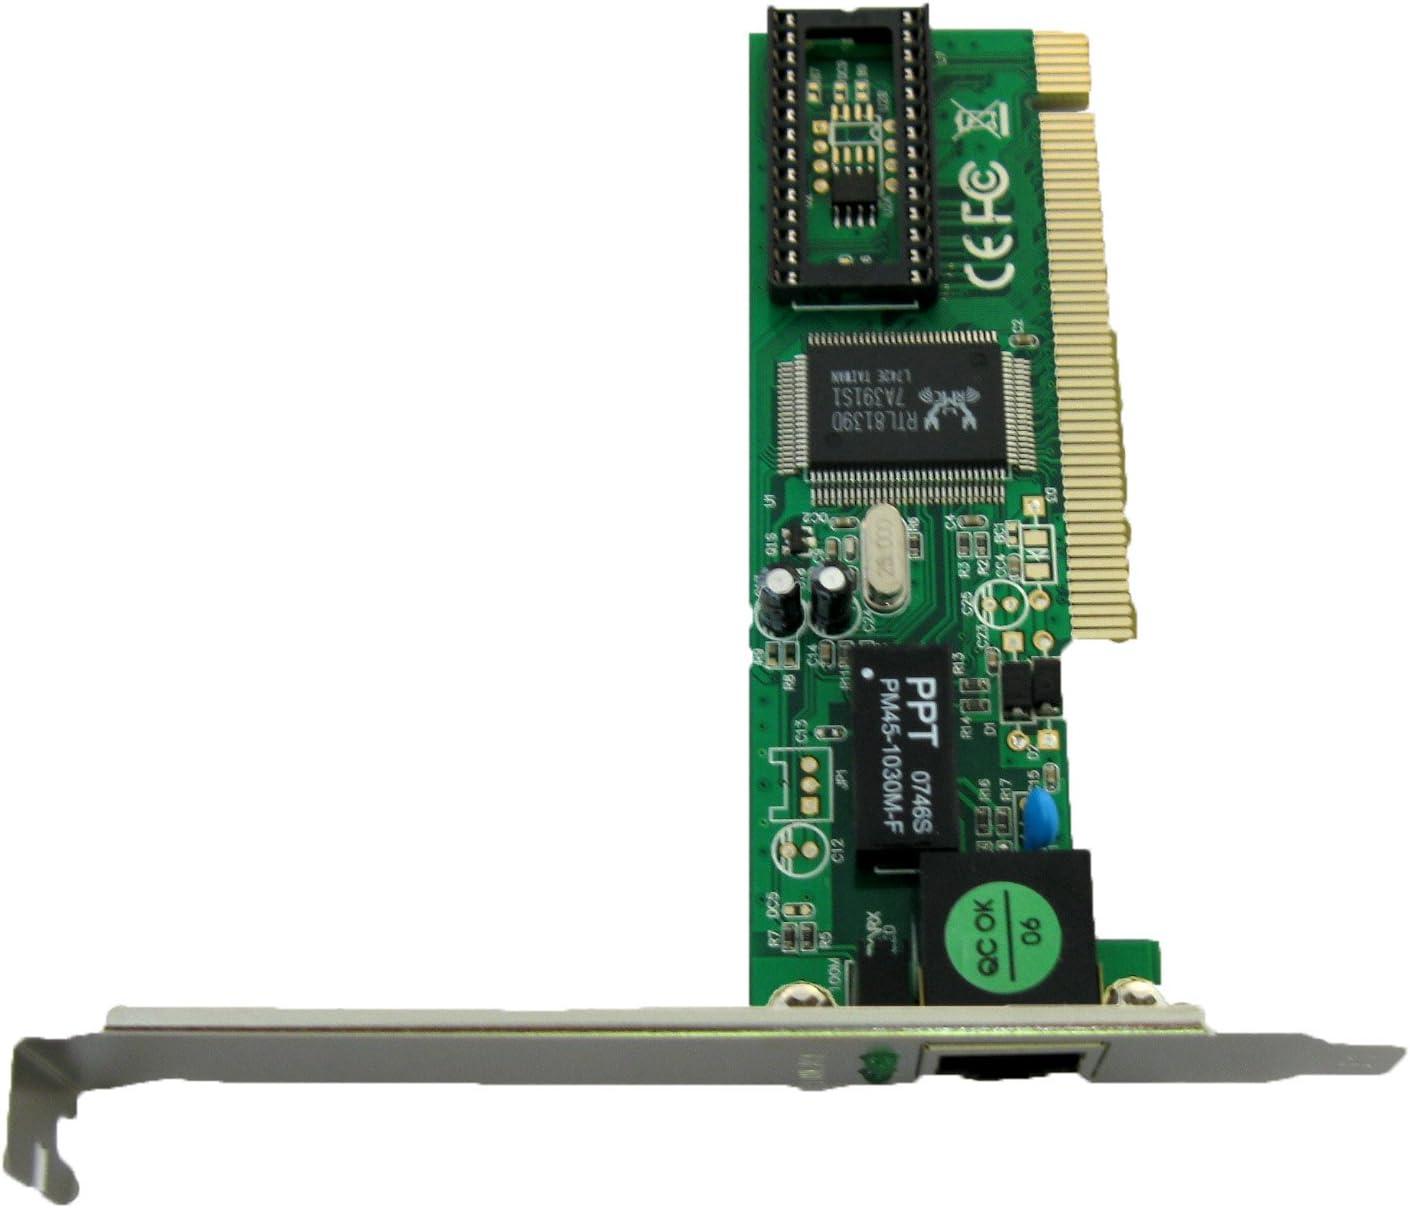 Semper Nwp 1 Pci Lan Card 10 100mb Retail Realtek Chip Computers Accessories